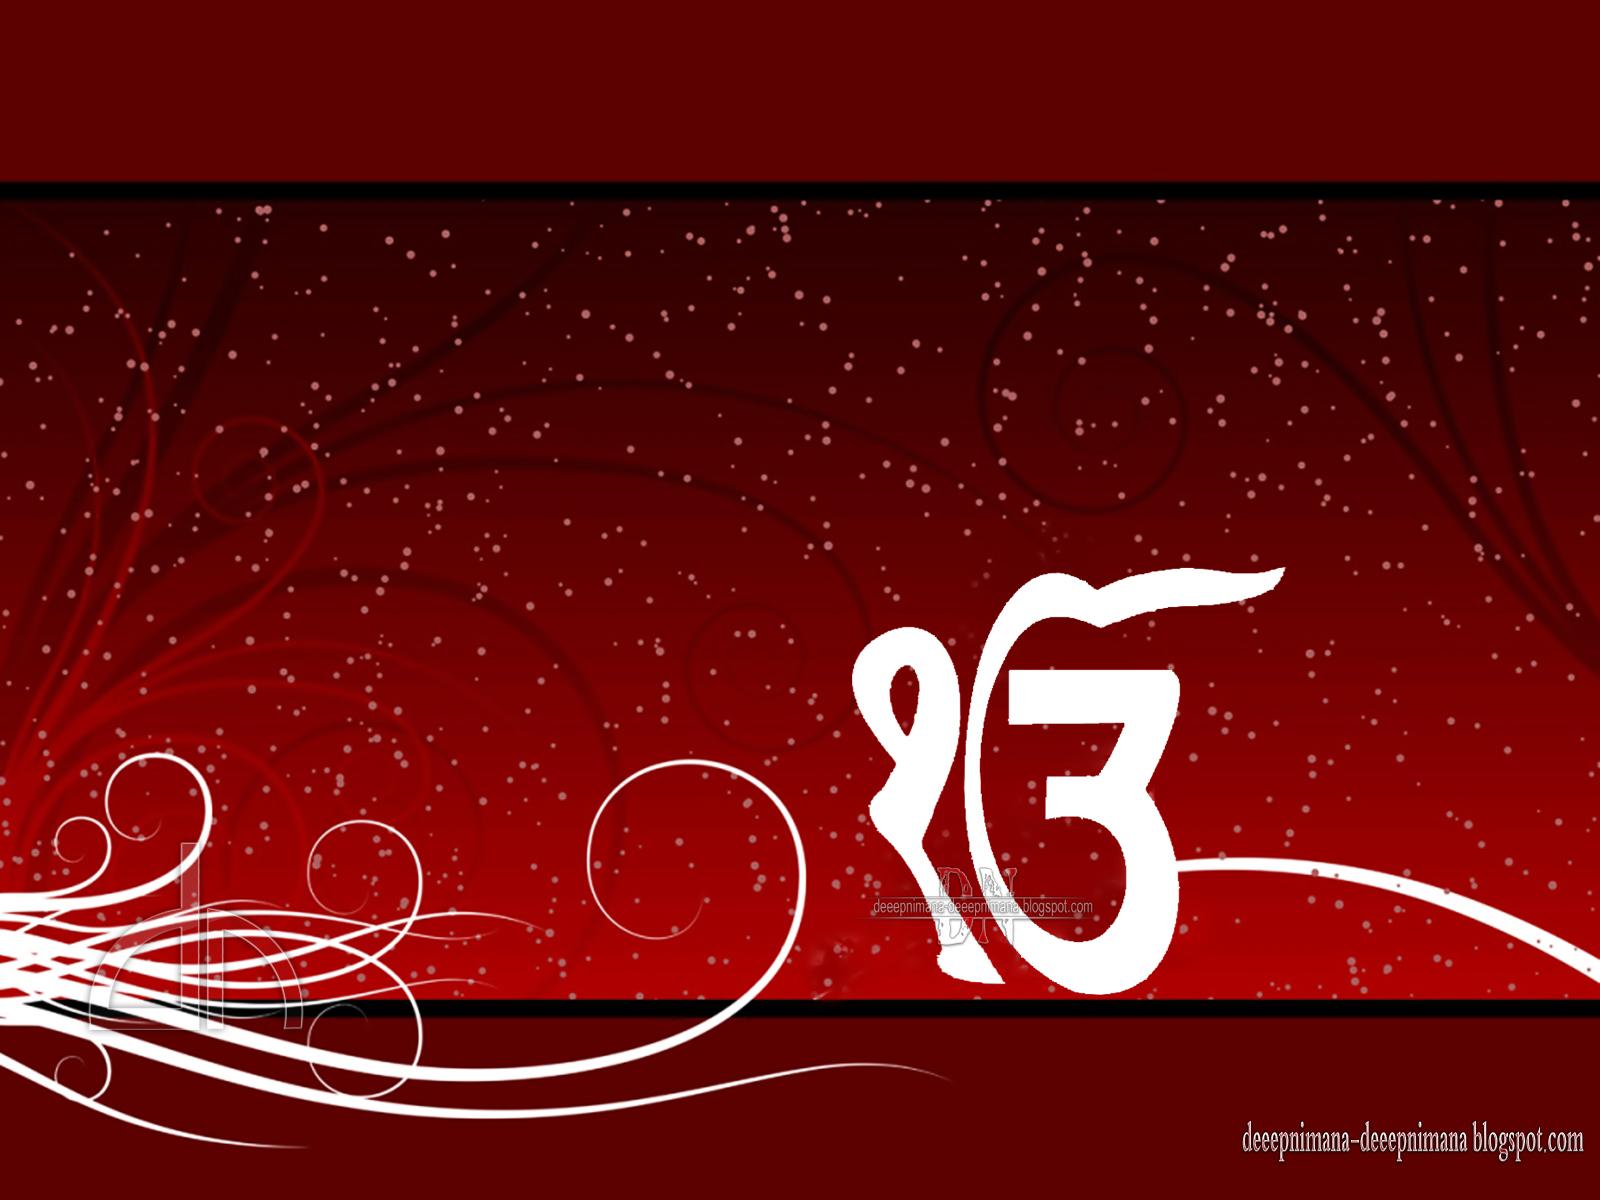 deeepnimana-deeepnimana blogspot.com: ek onkar